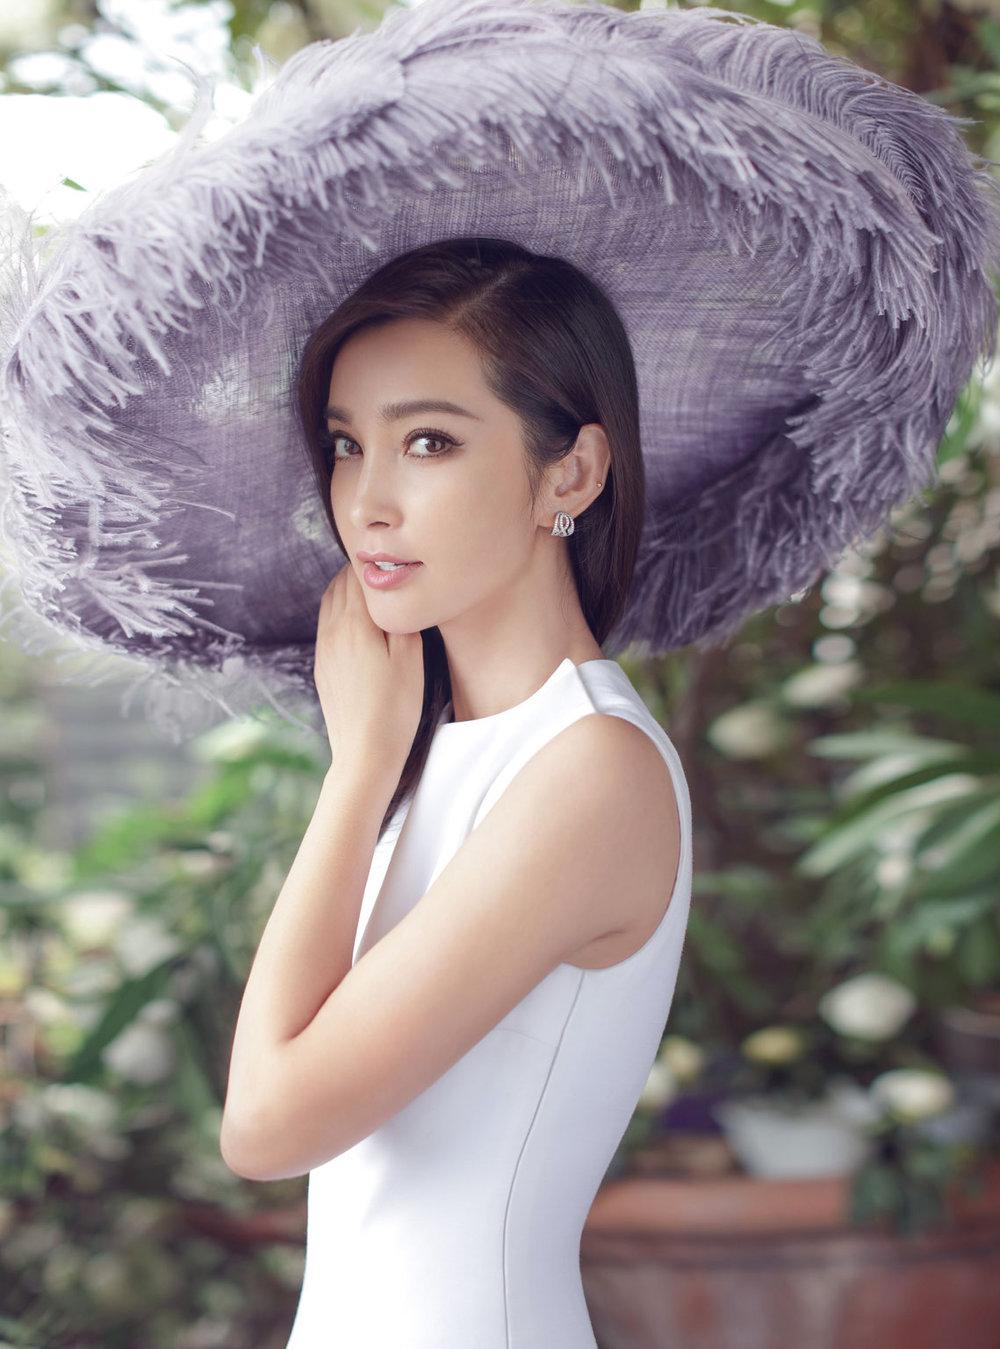 Li Bingbing Is Pure Elegance Lensed By Chen Man For Harper